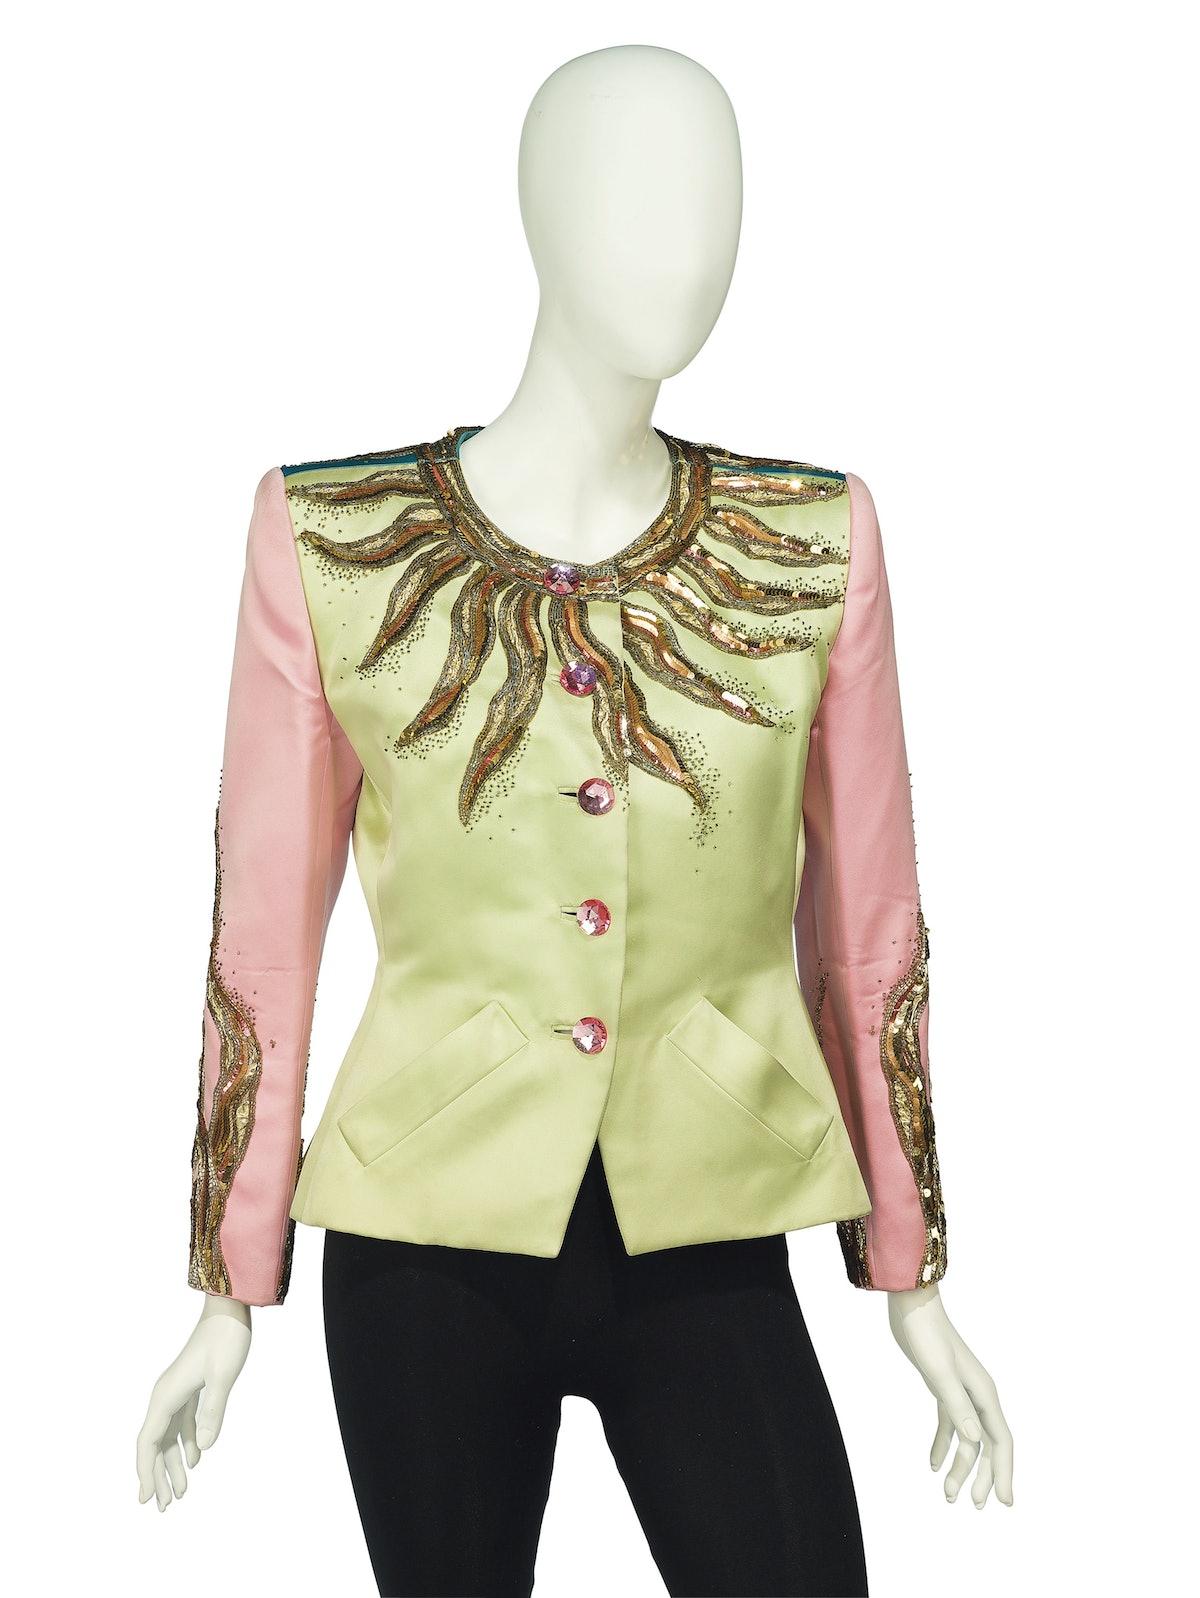 YSL embroidered cocktail jacket (estimate £1,000-2,000)